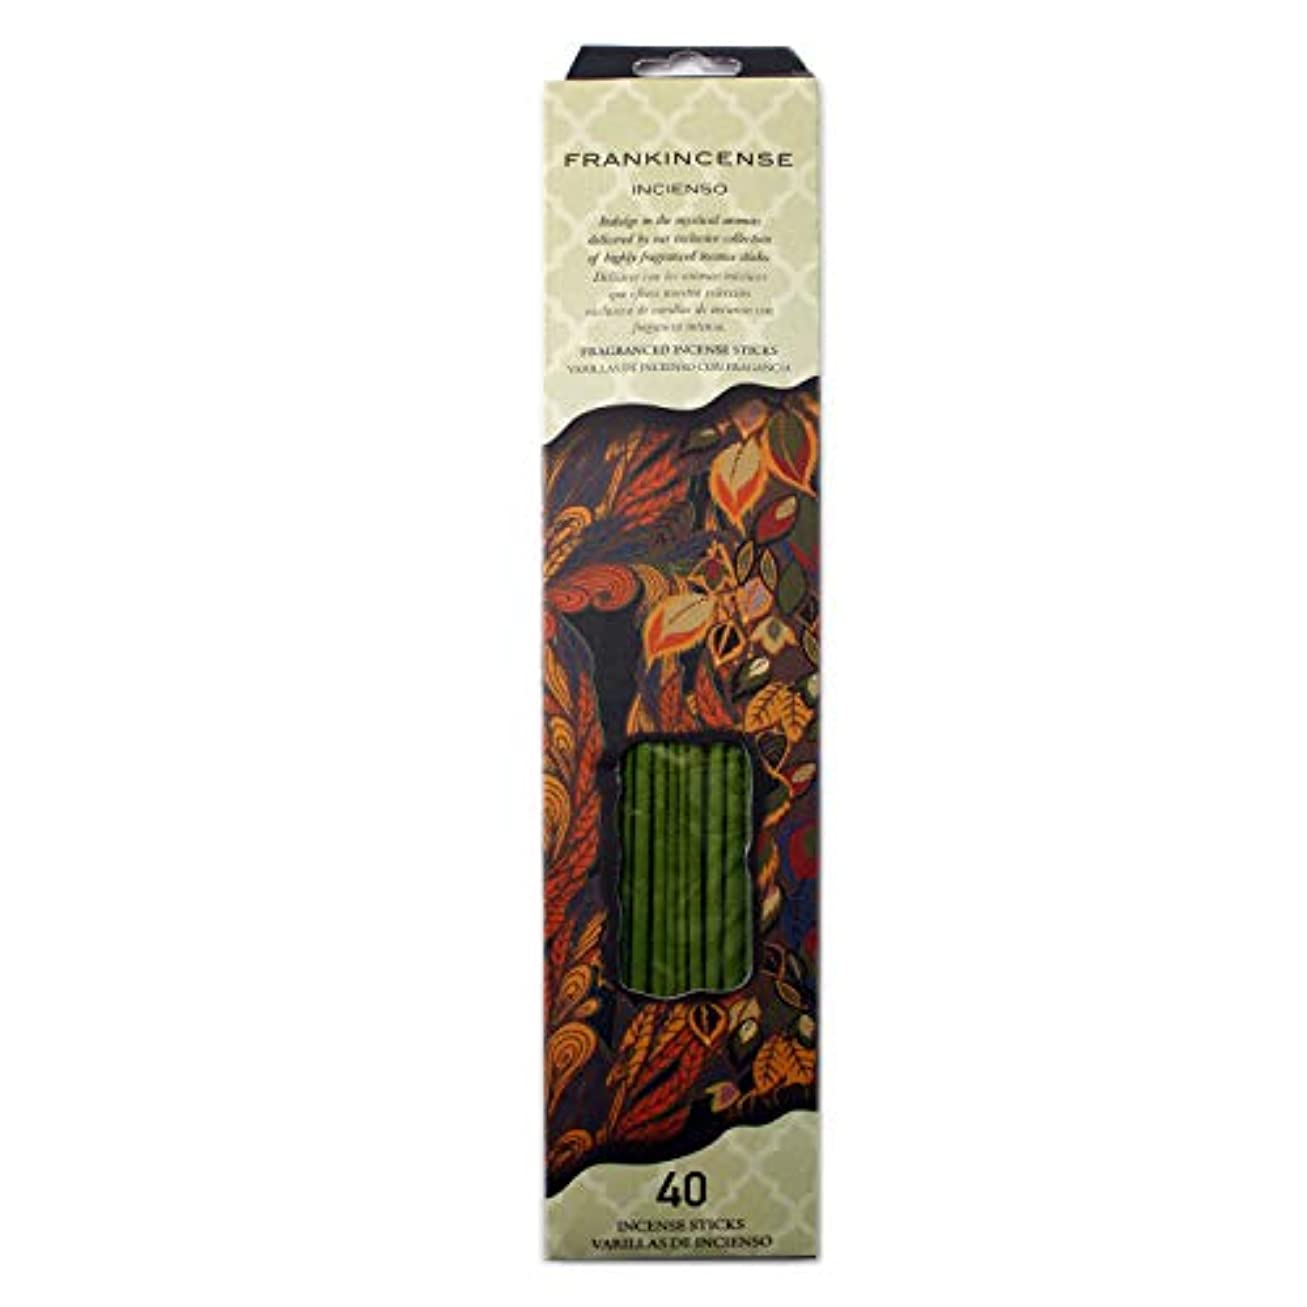 Incense Sticks, Frankincense